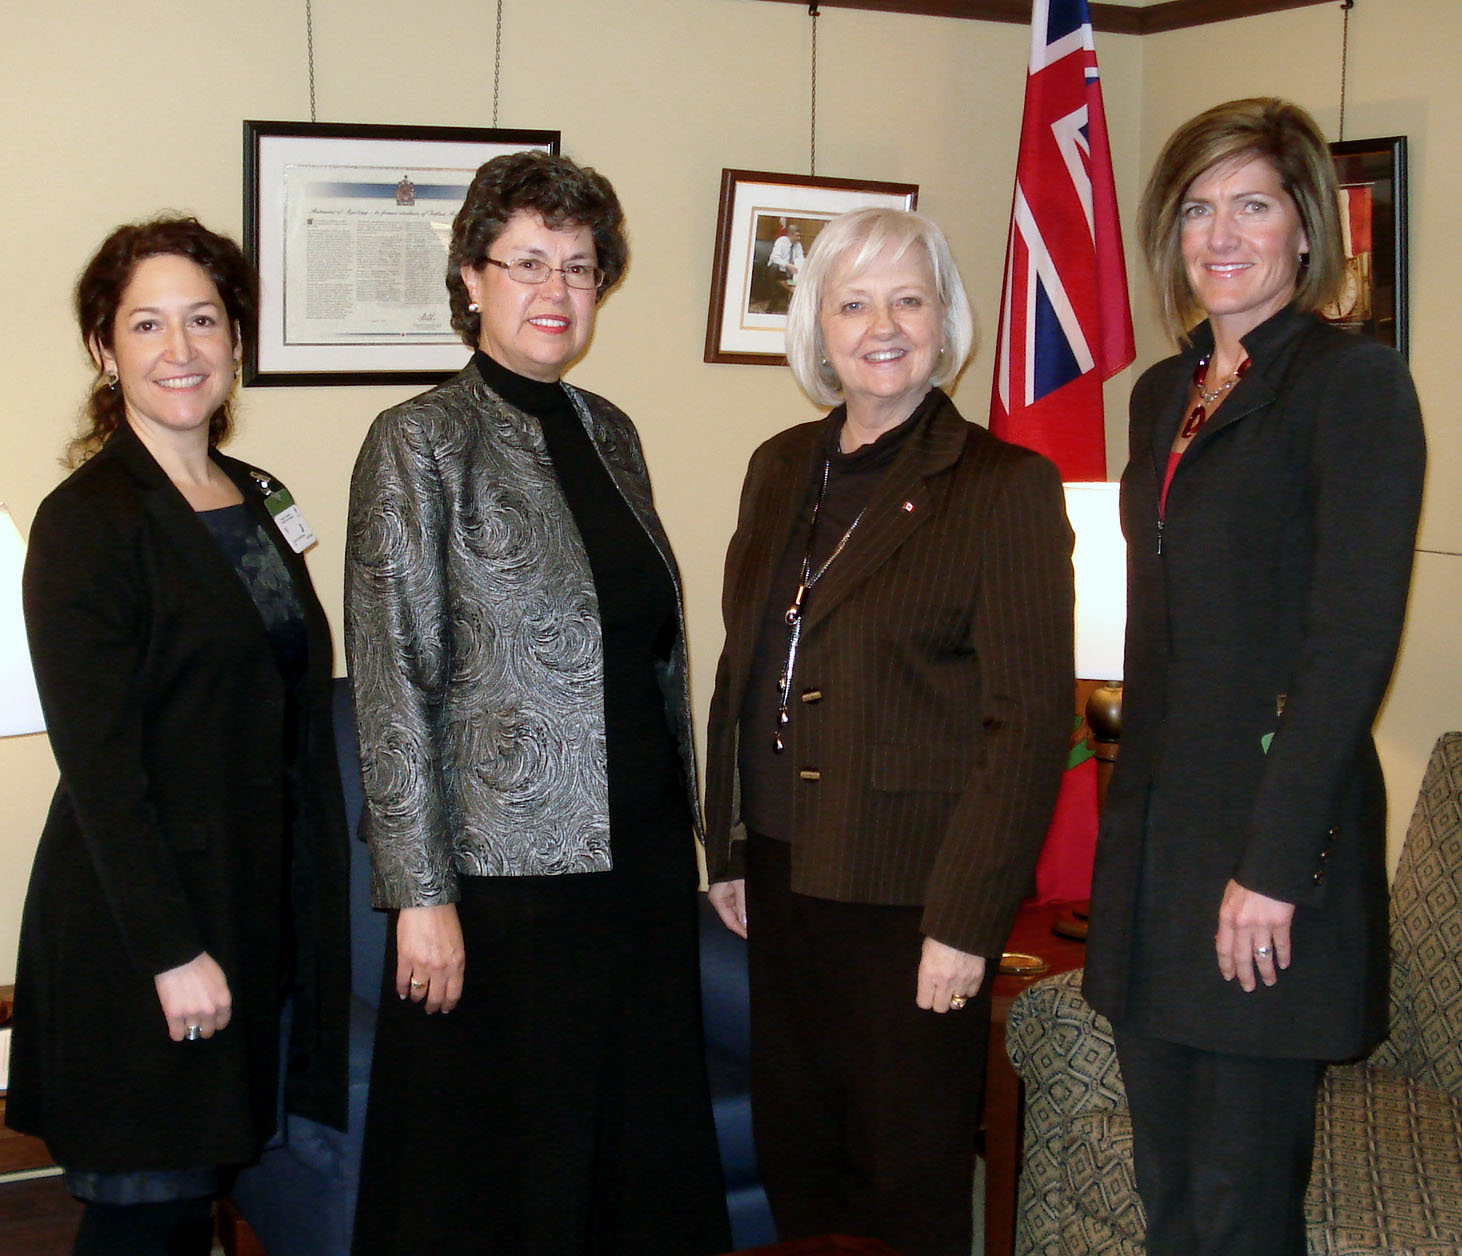 CASLPA senior staff pose with Ms. Joy Smith, MP for Kildonan – St. Paul, MB.